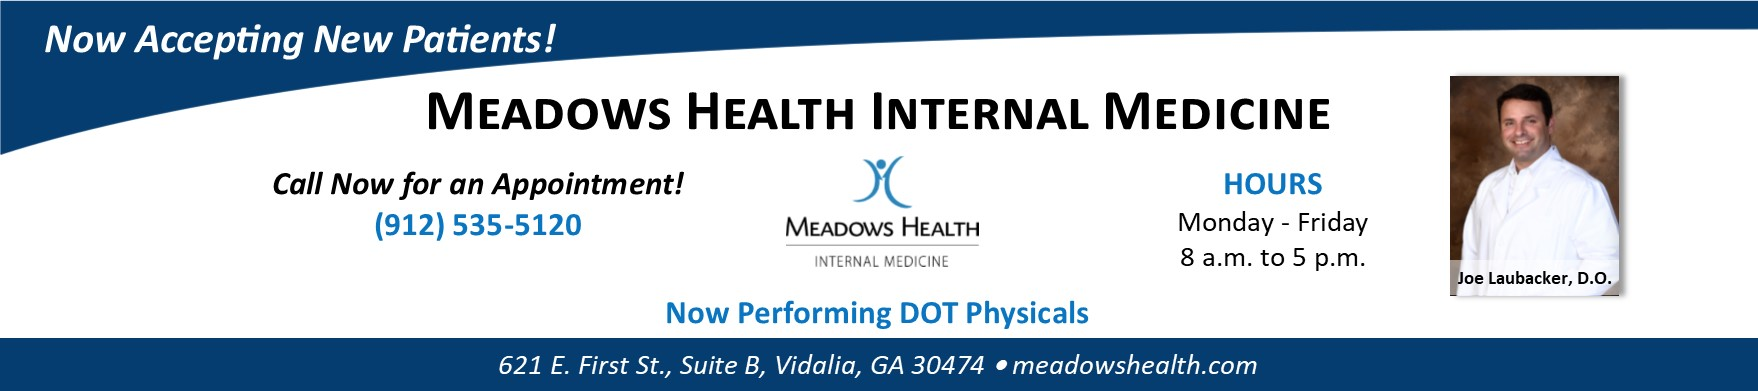 MRMC - Internal Medicine (2)